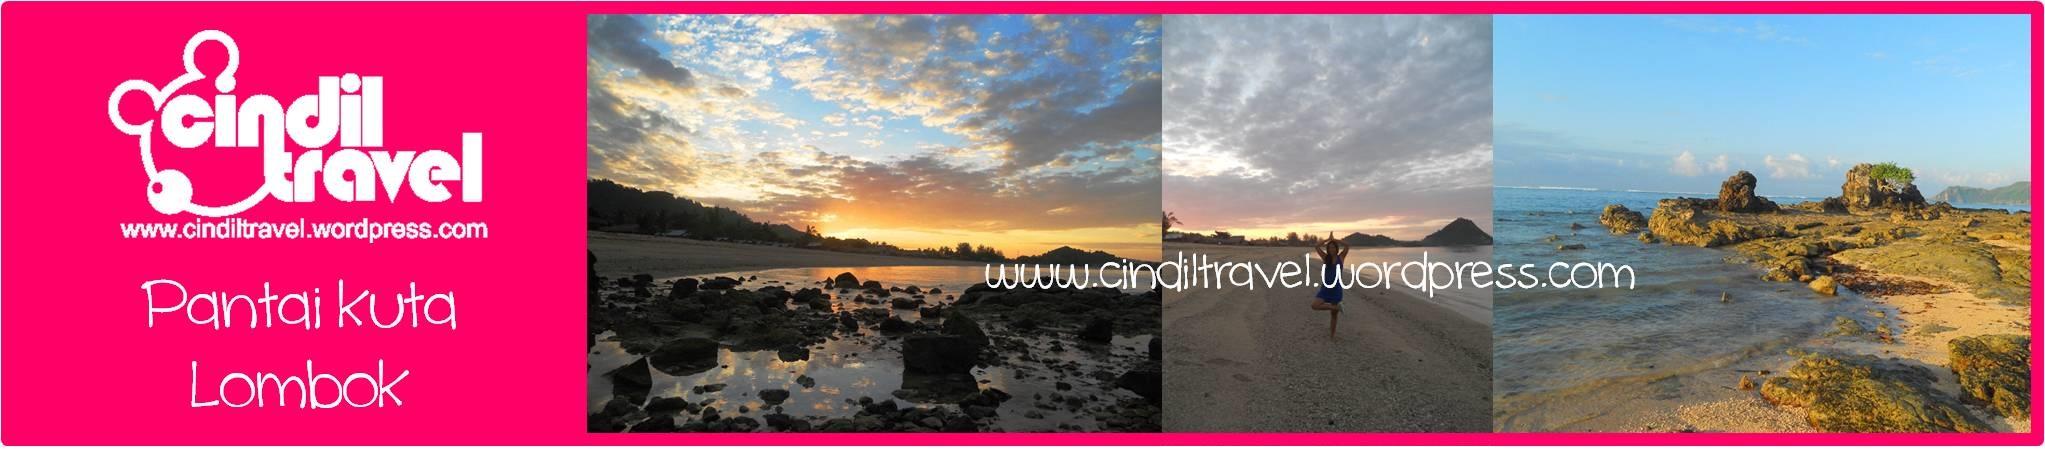 Pantai Kuta Lombok Cindiltravel 1